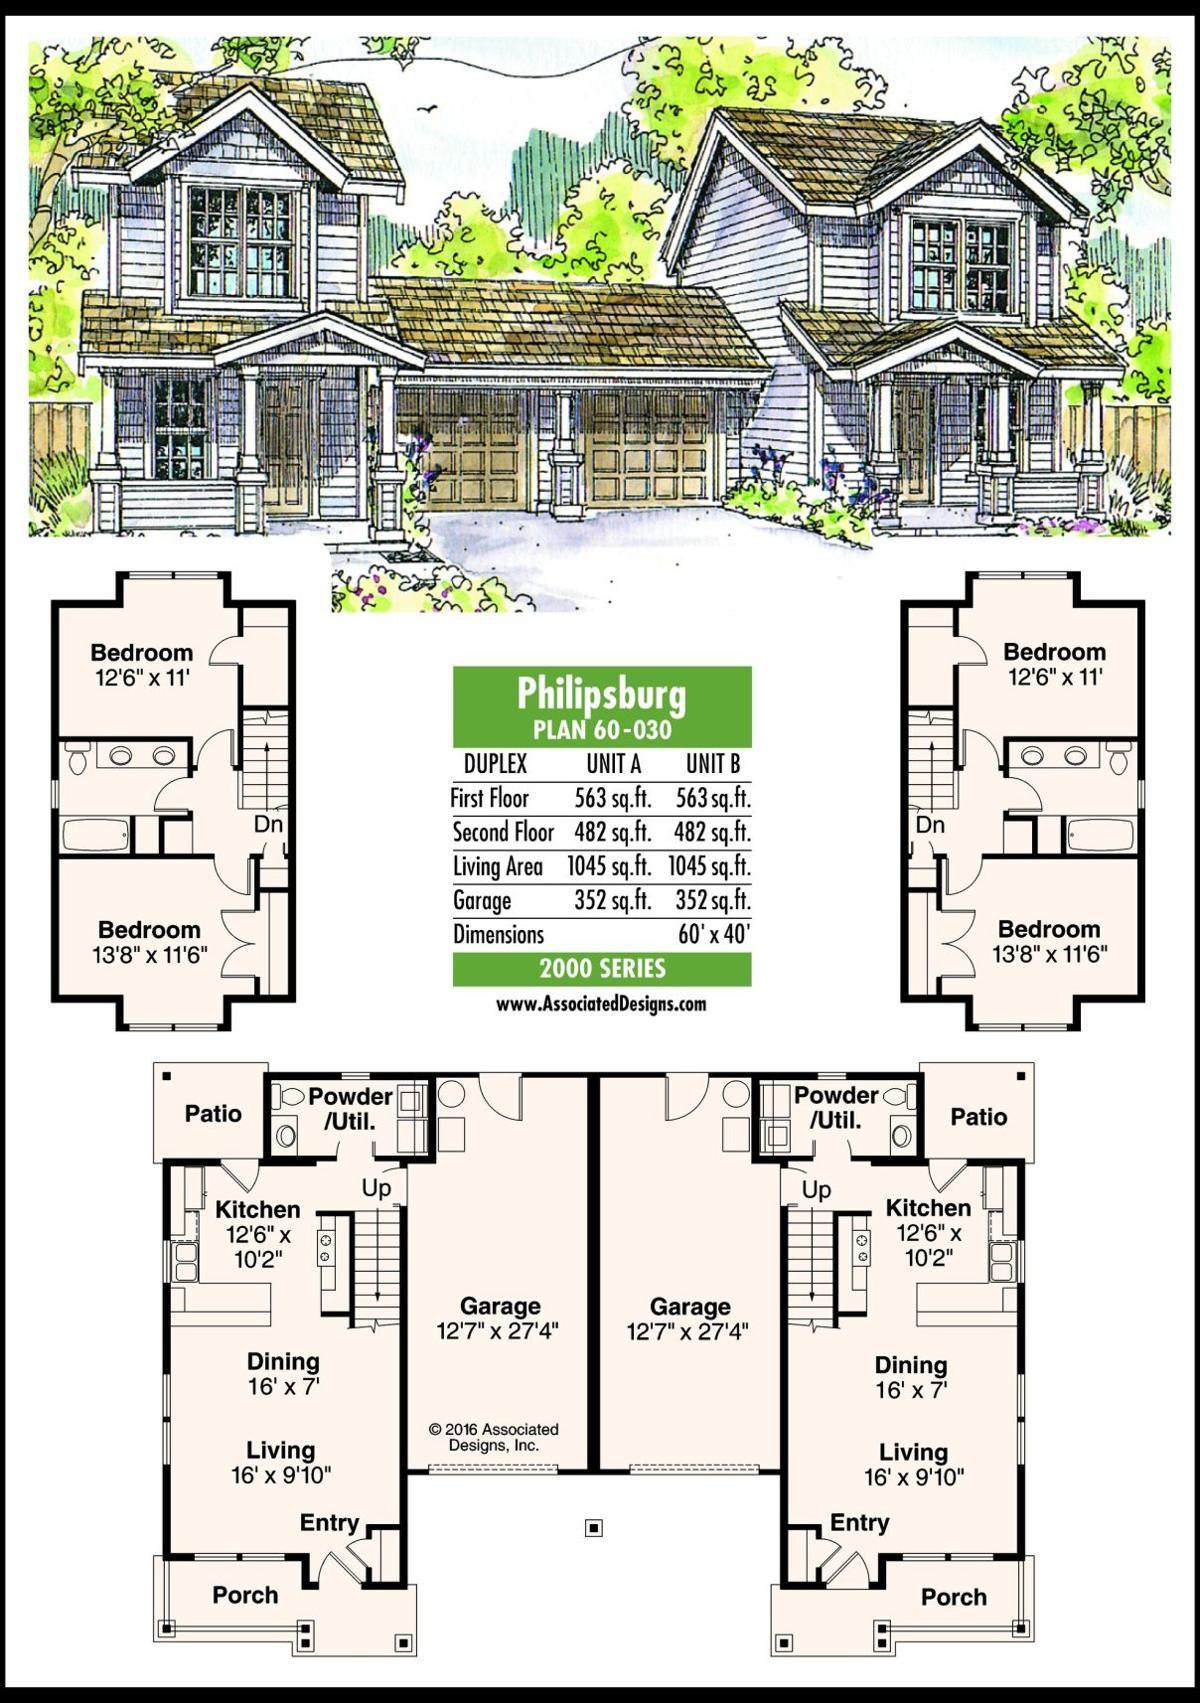 This week's house plan Philipsburg 60-030